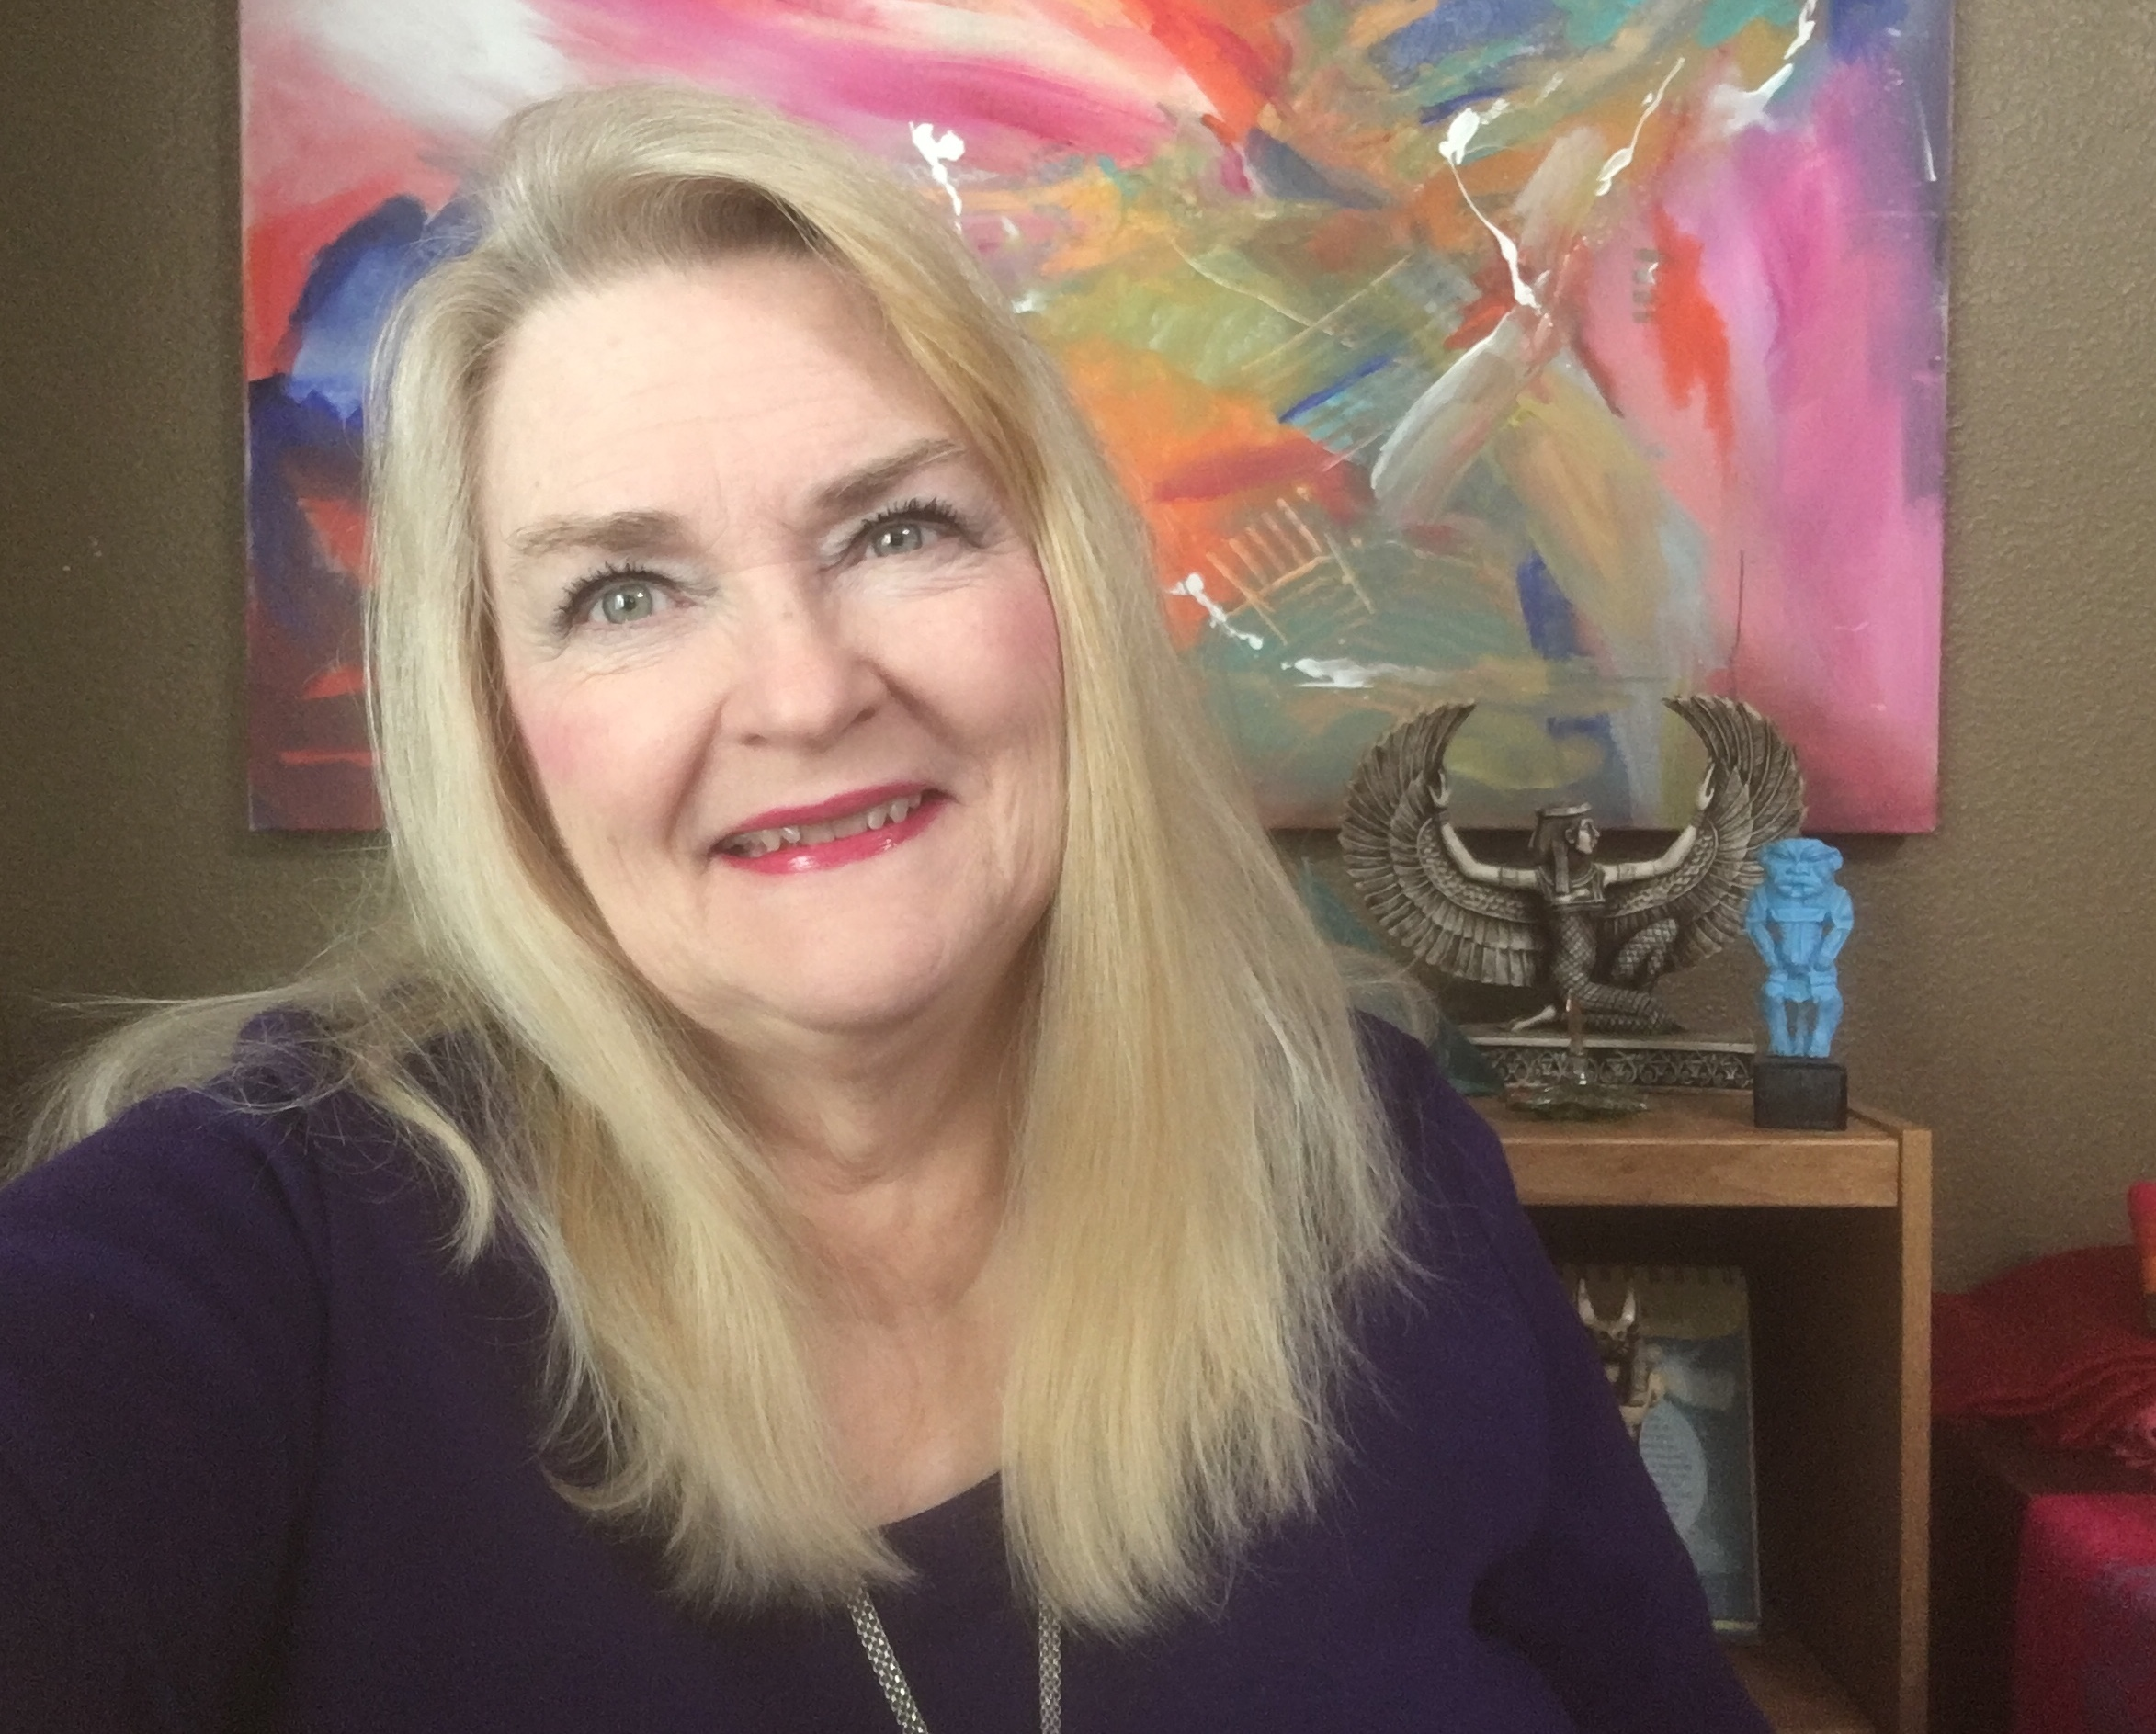 Rajenaira-Dr. Madalyn Kennedy